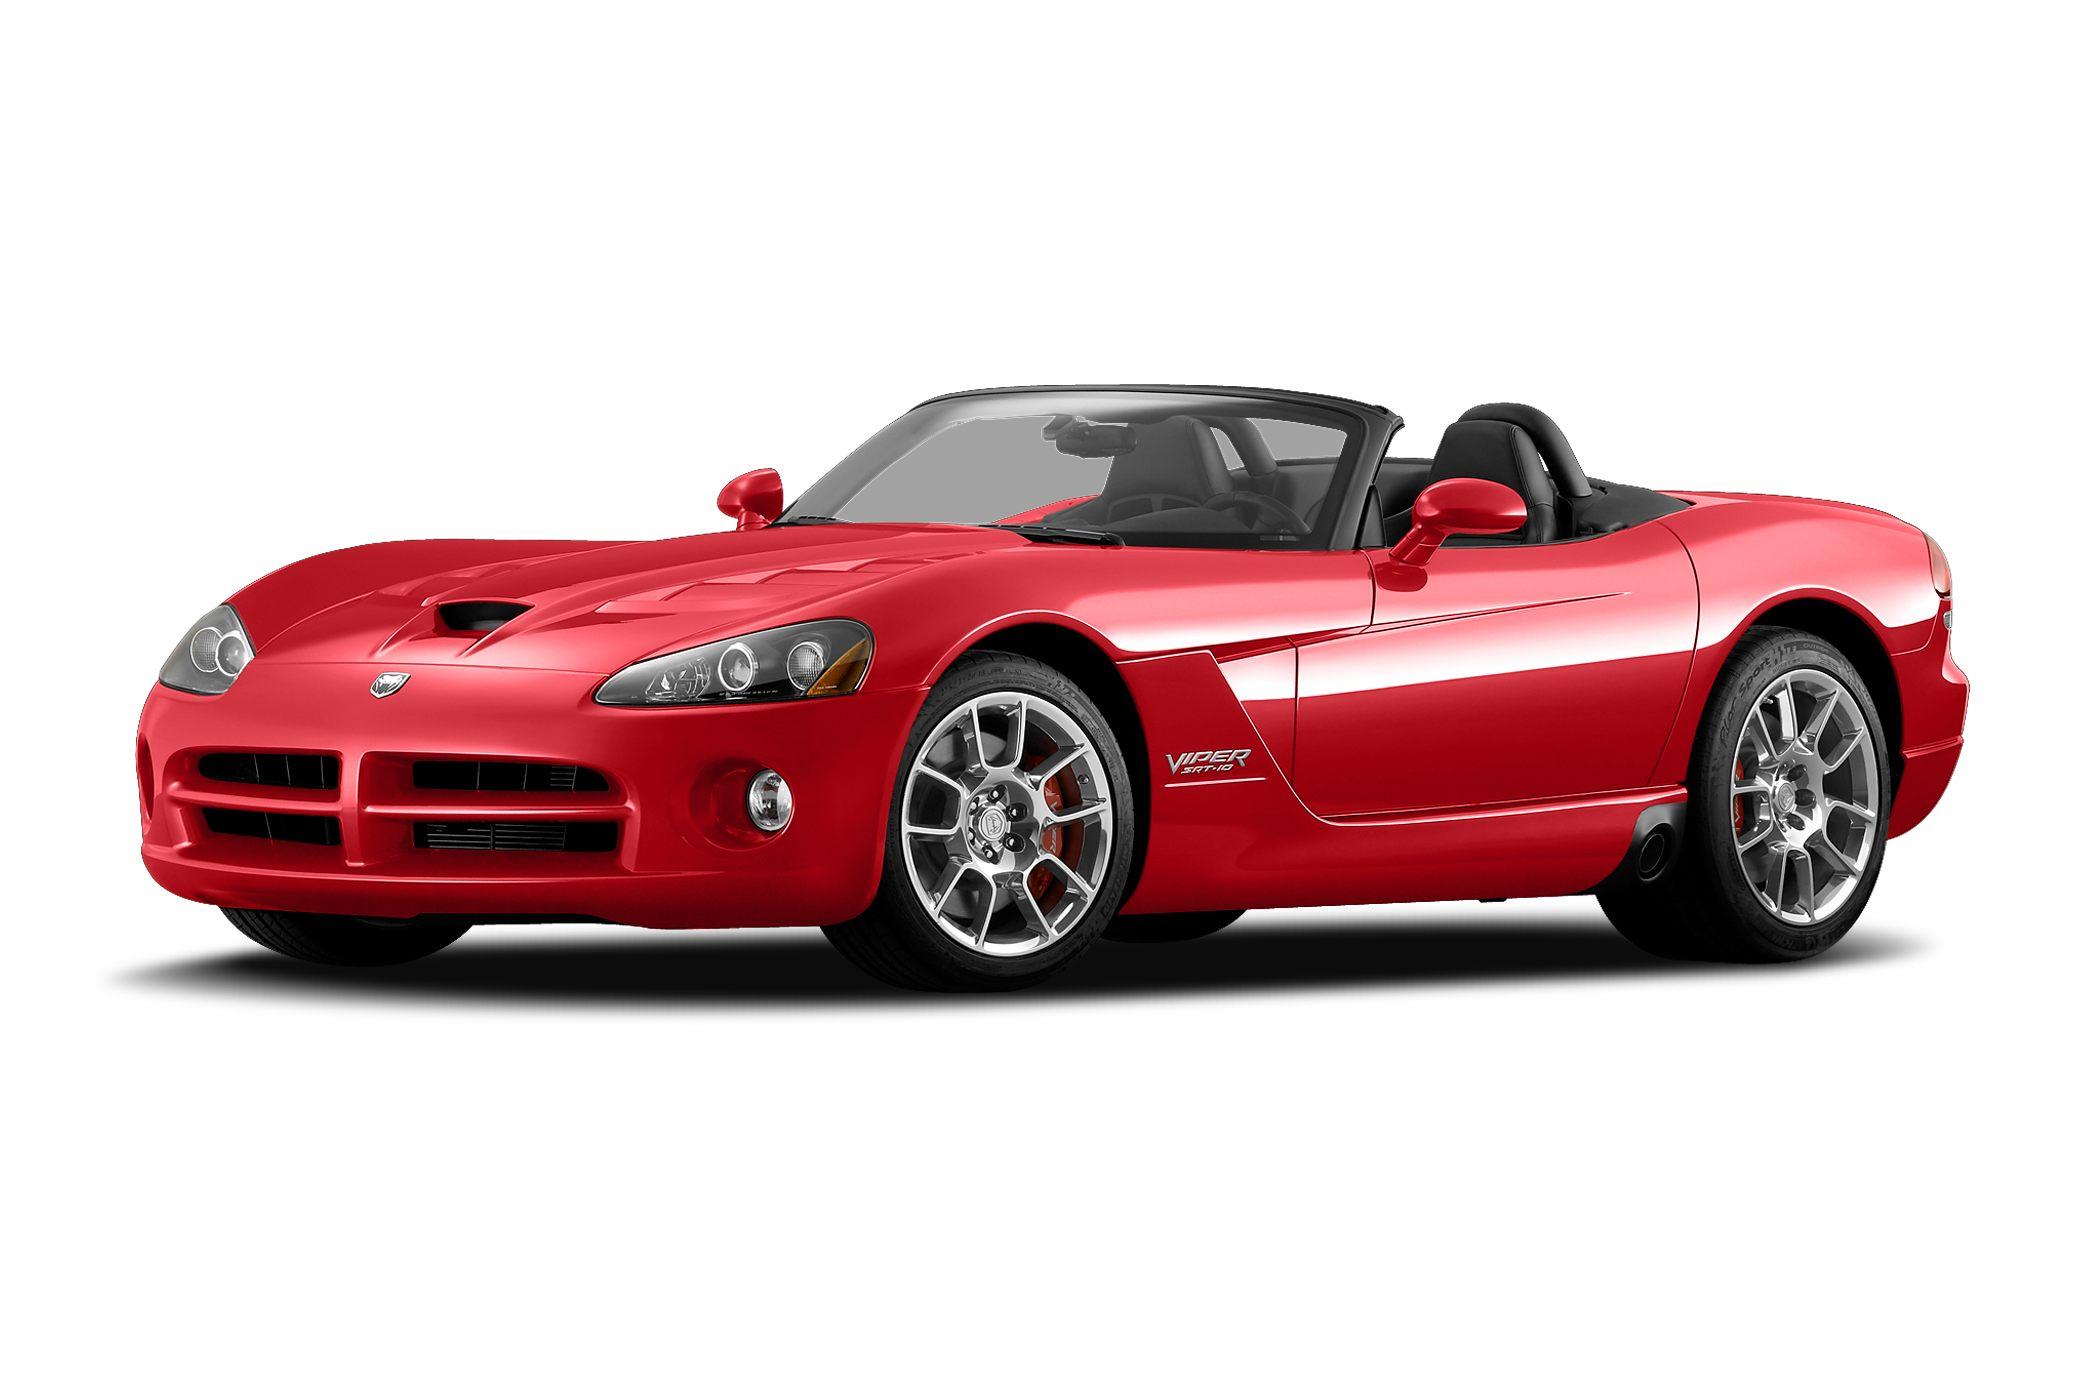 2008 Dodge Viper Specs and Prices